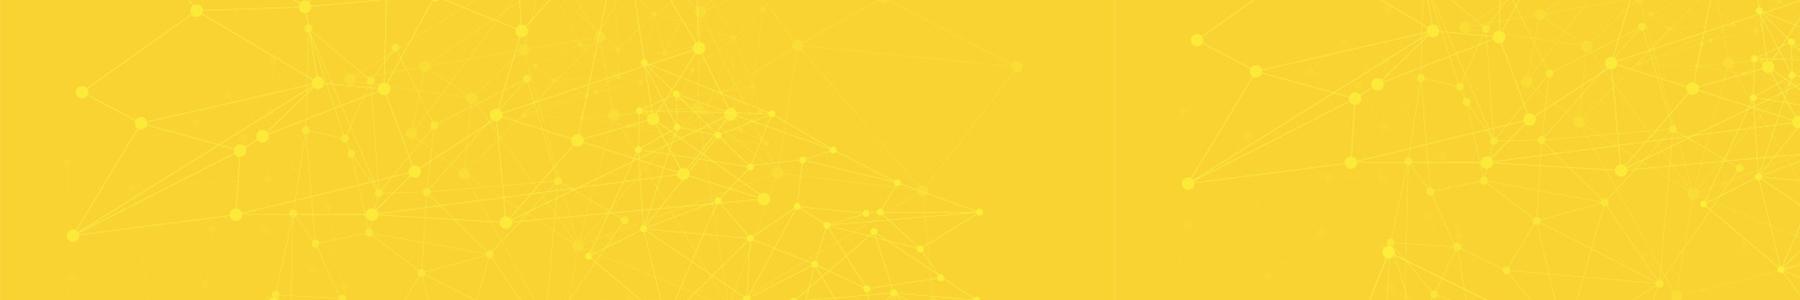 Tεχνολογίες Πληροφορίας και Επικοινωνιών - Ε' Δημοτικού - 1ο Δημοτικό Ύδρας